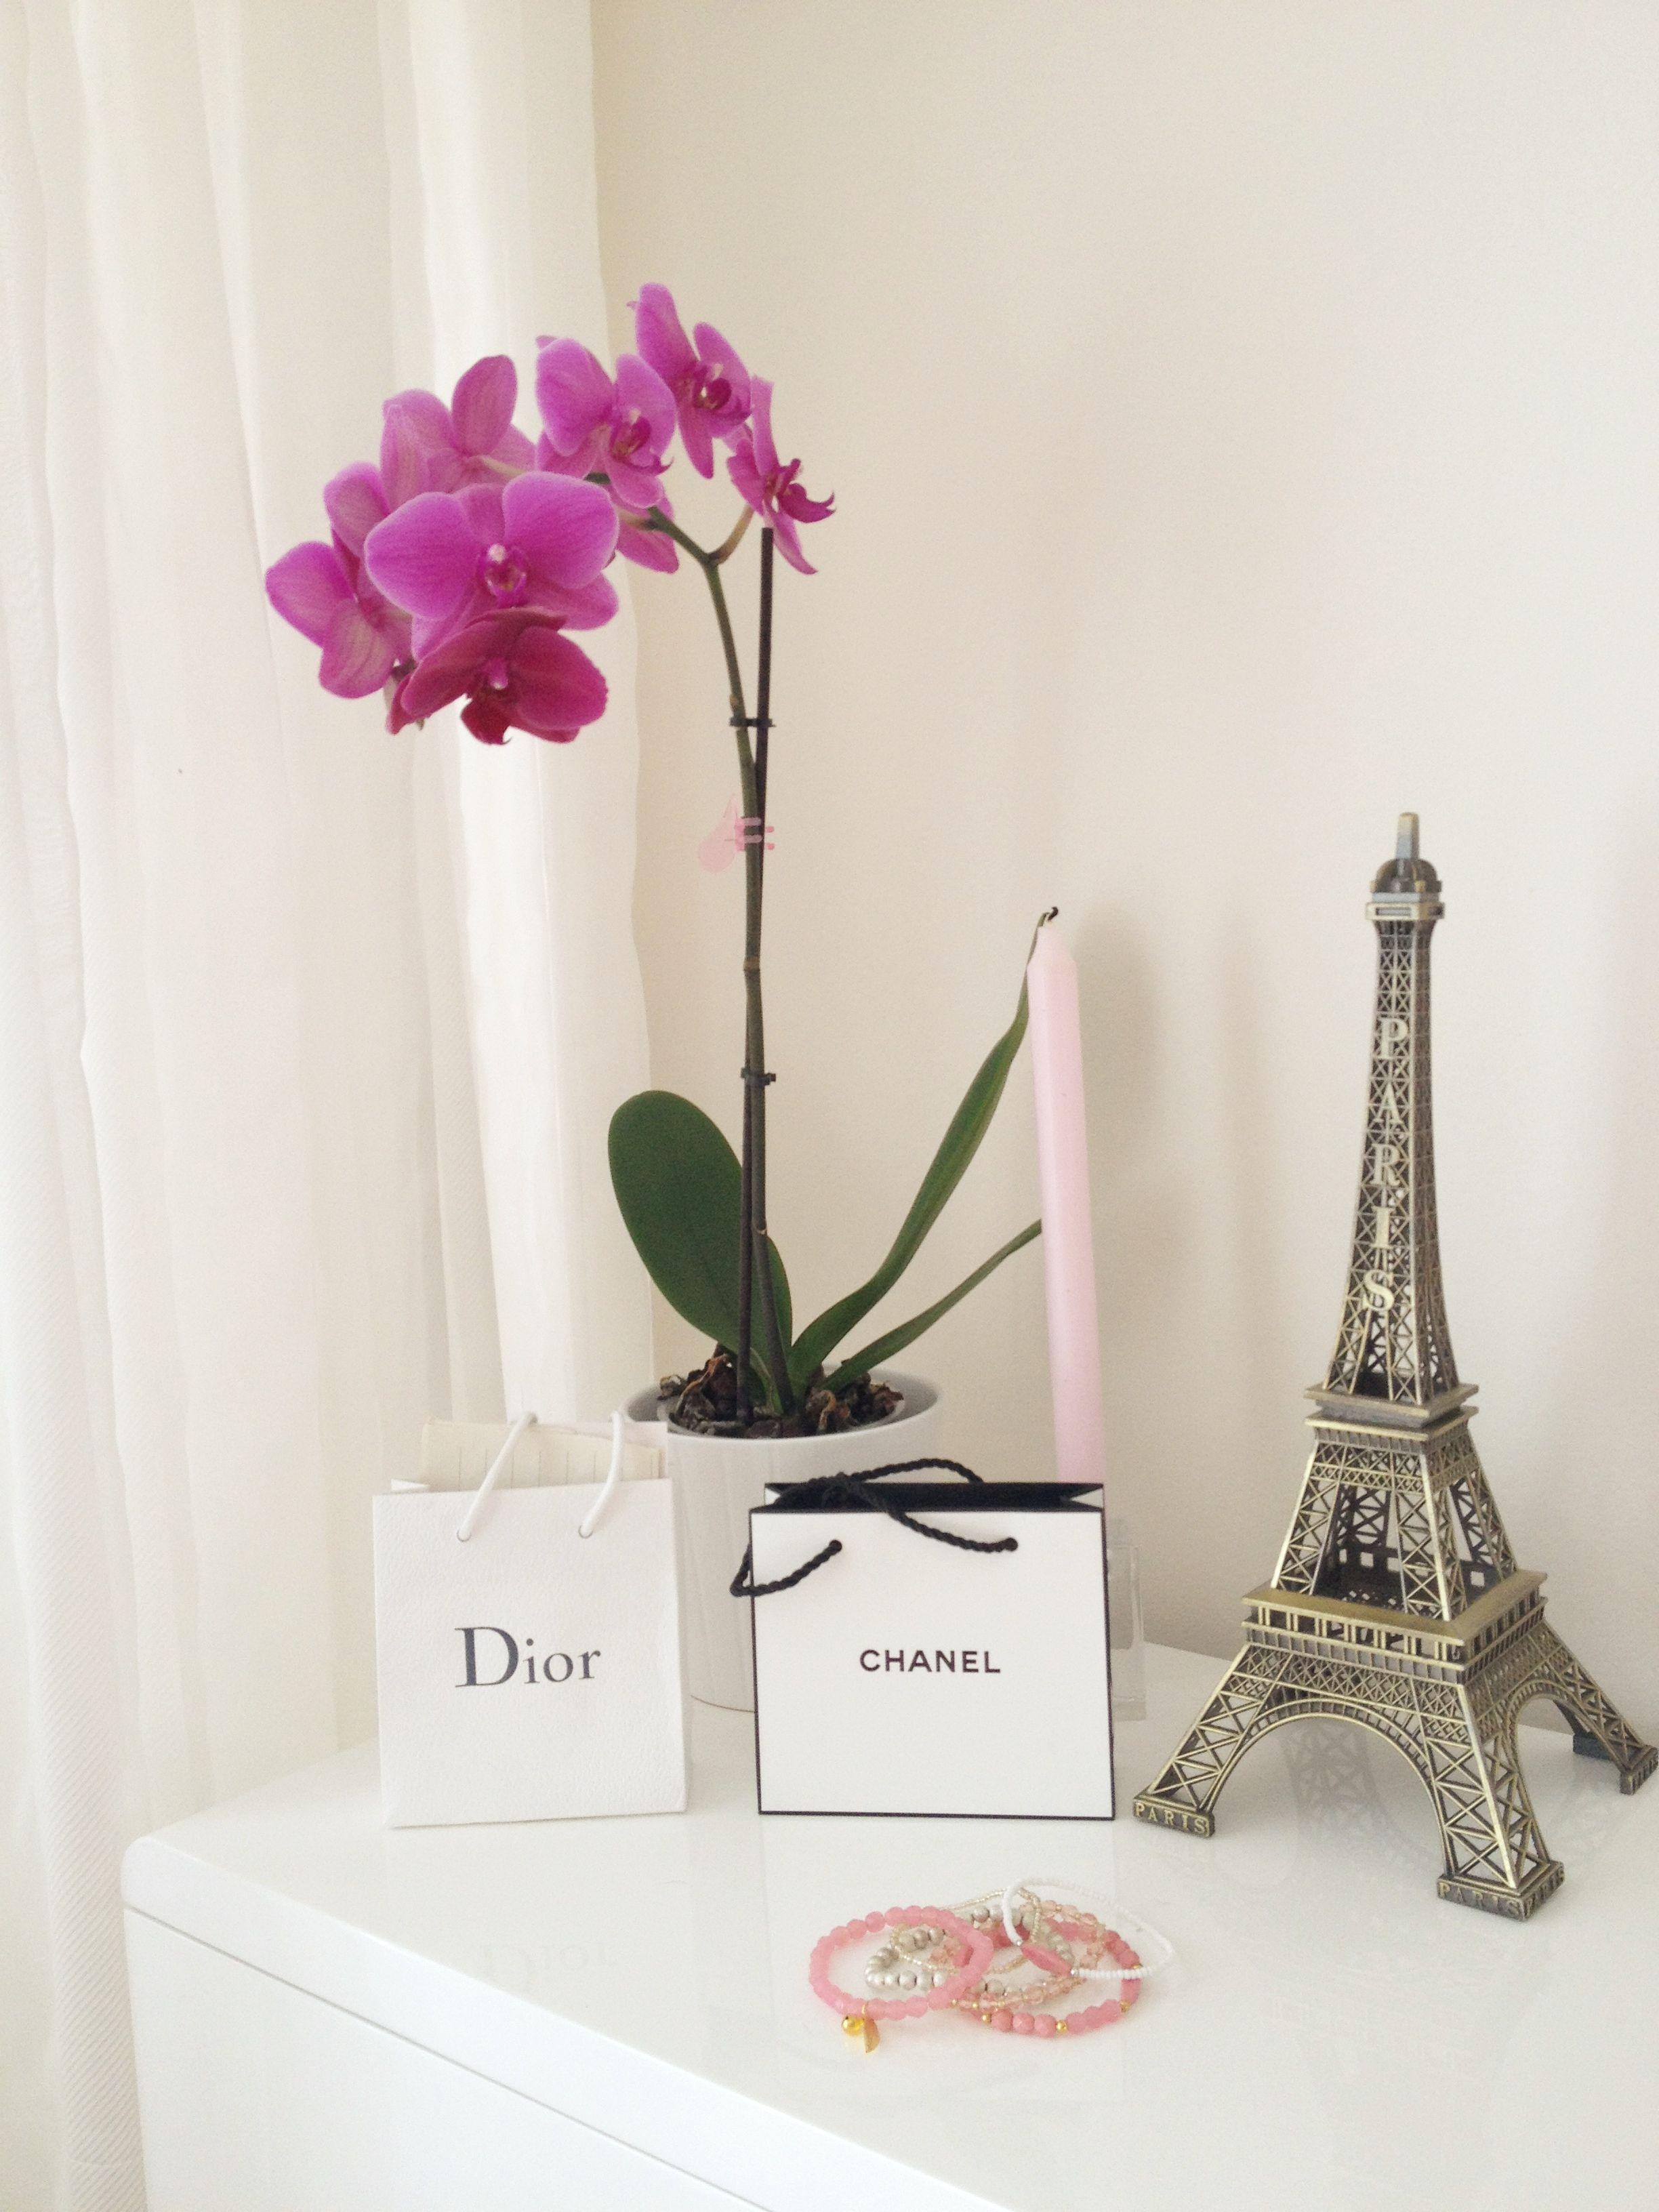 Coco Home Decor Eiffel Tower Chanel Dior